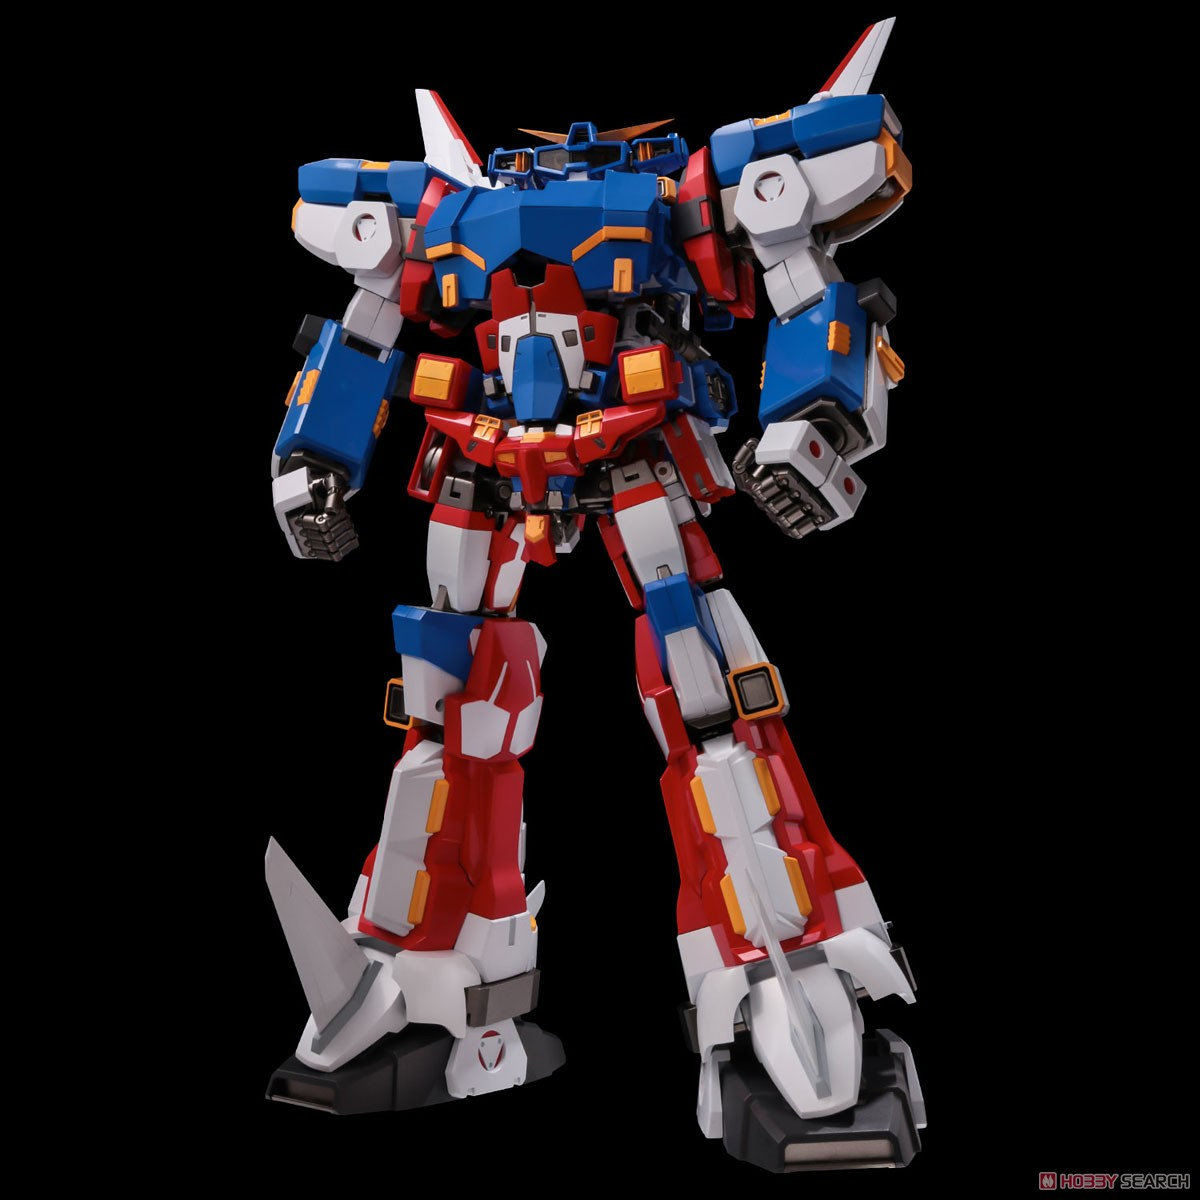 RIOBOT『変形合体 R-1』スーパーロボット大戦OG 可変合体フィギュア-041